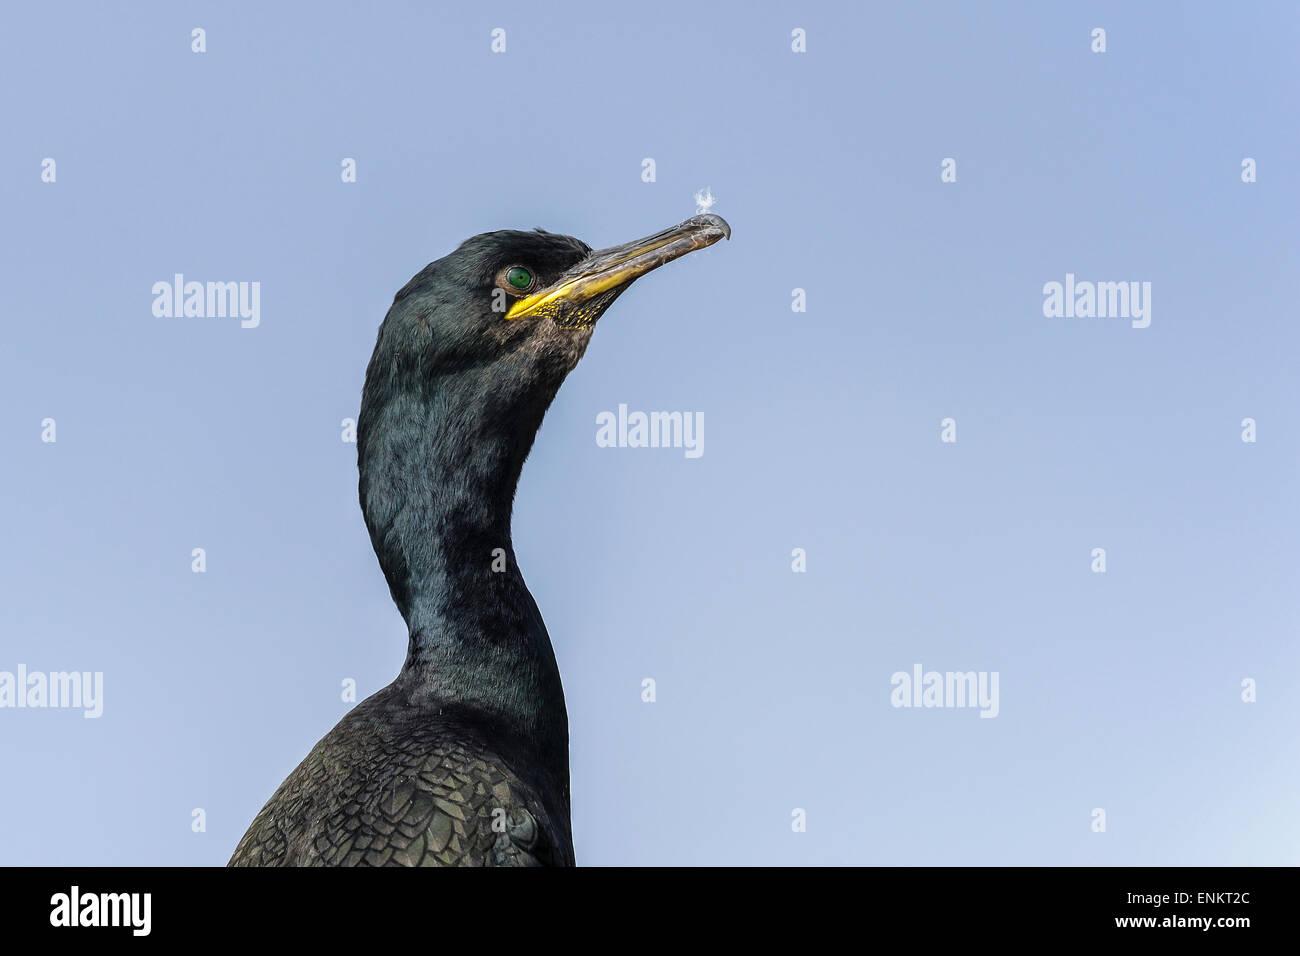 european shag, phalacrocorax aristotelis - Stock Image